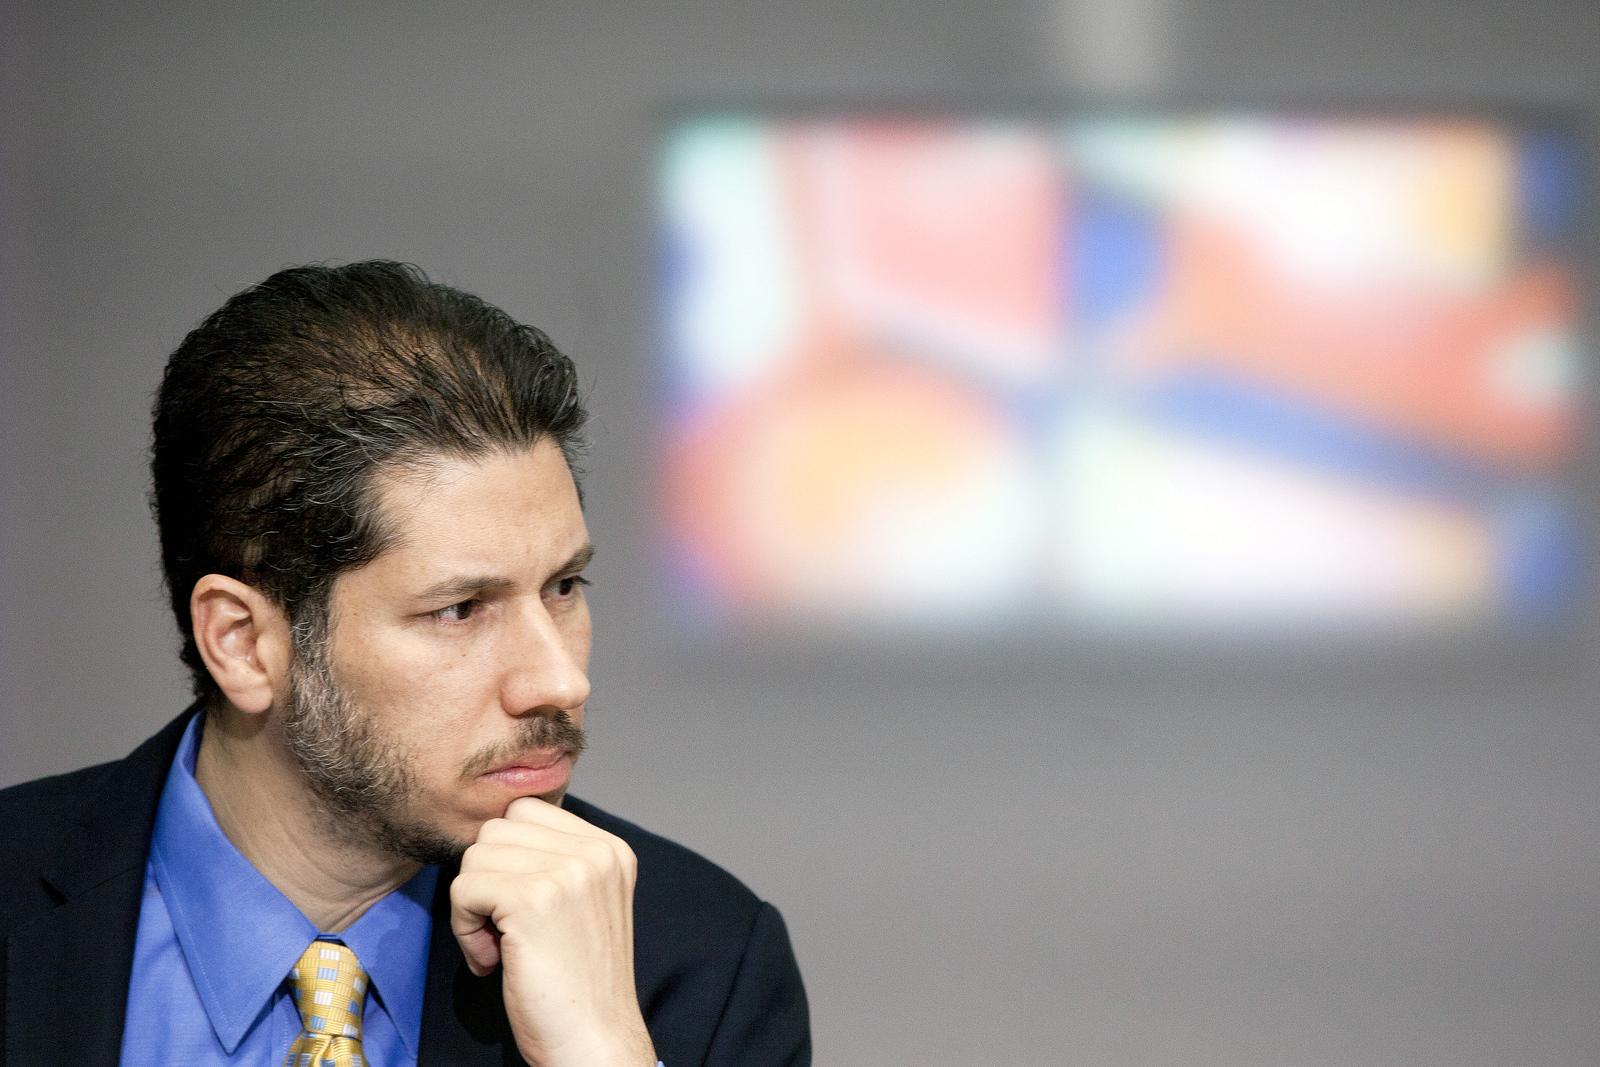 Mario Arvelo